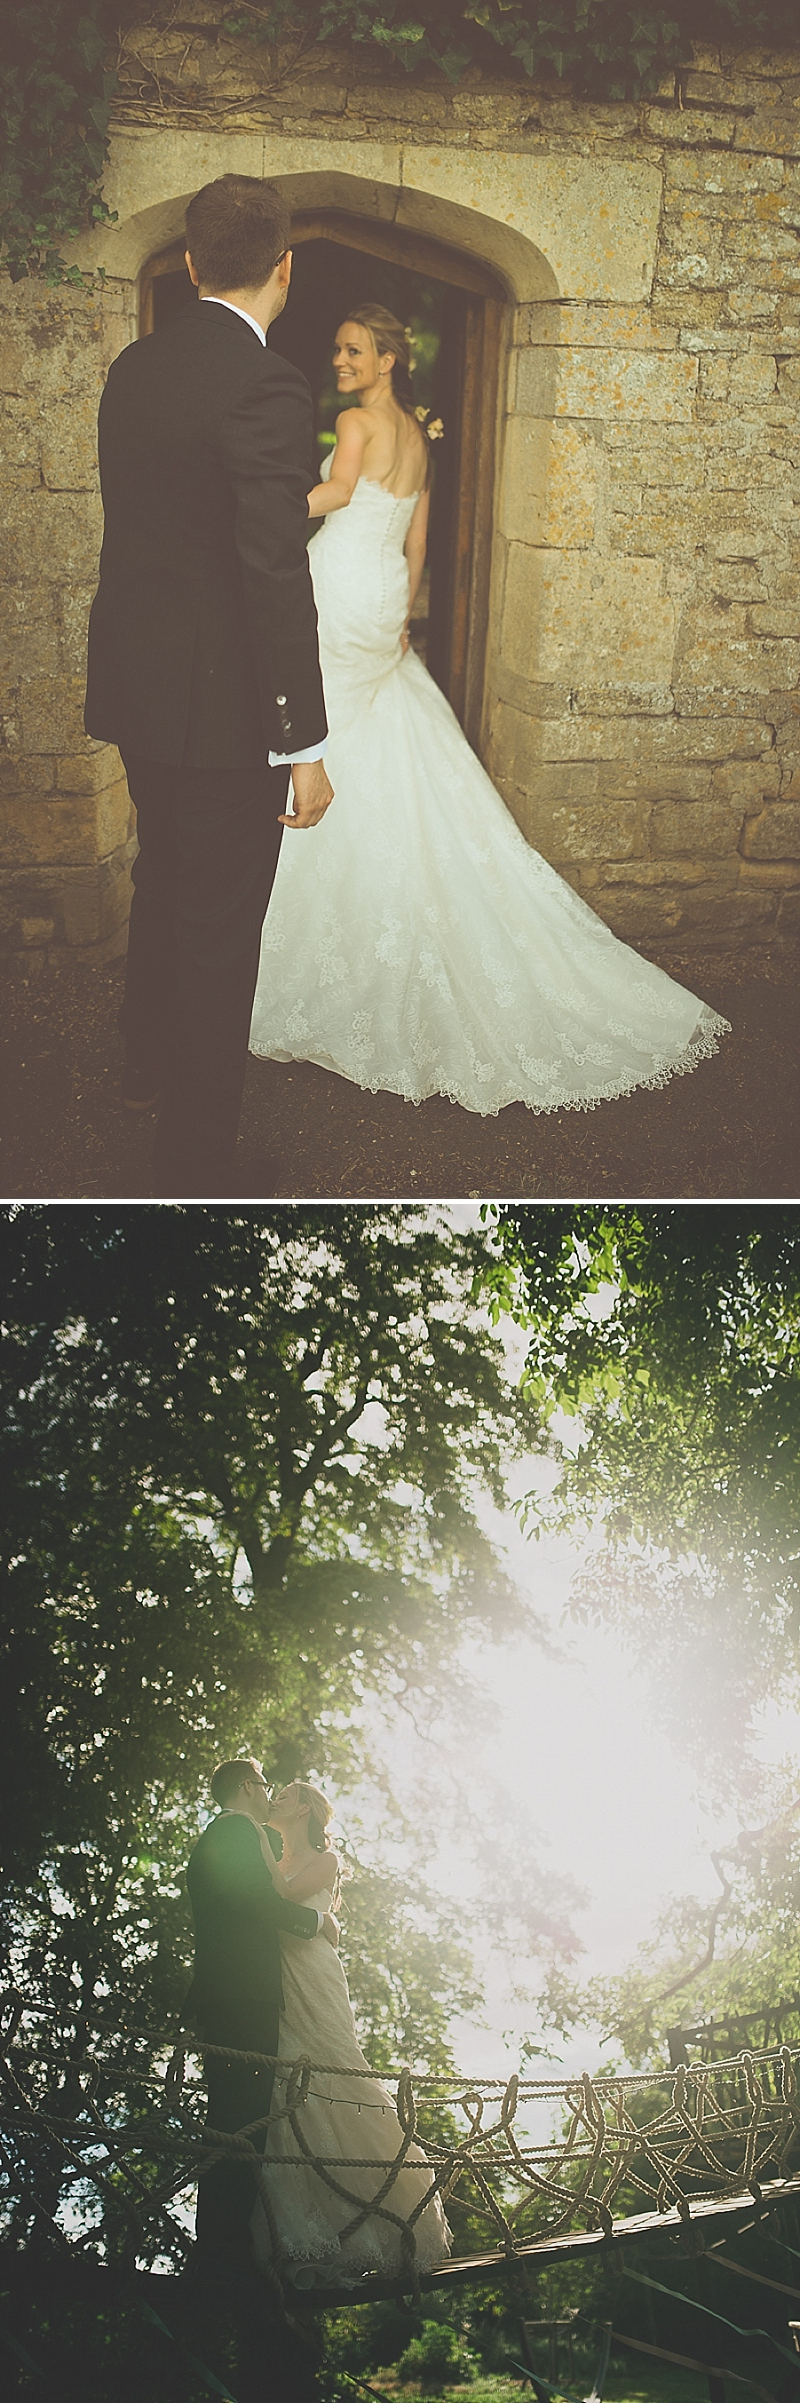 Hire A Band For Wedding 57 Beautiful A secret garden tea